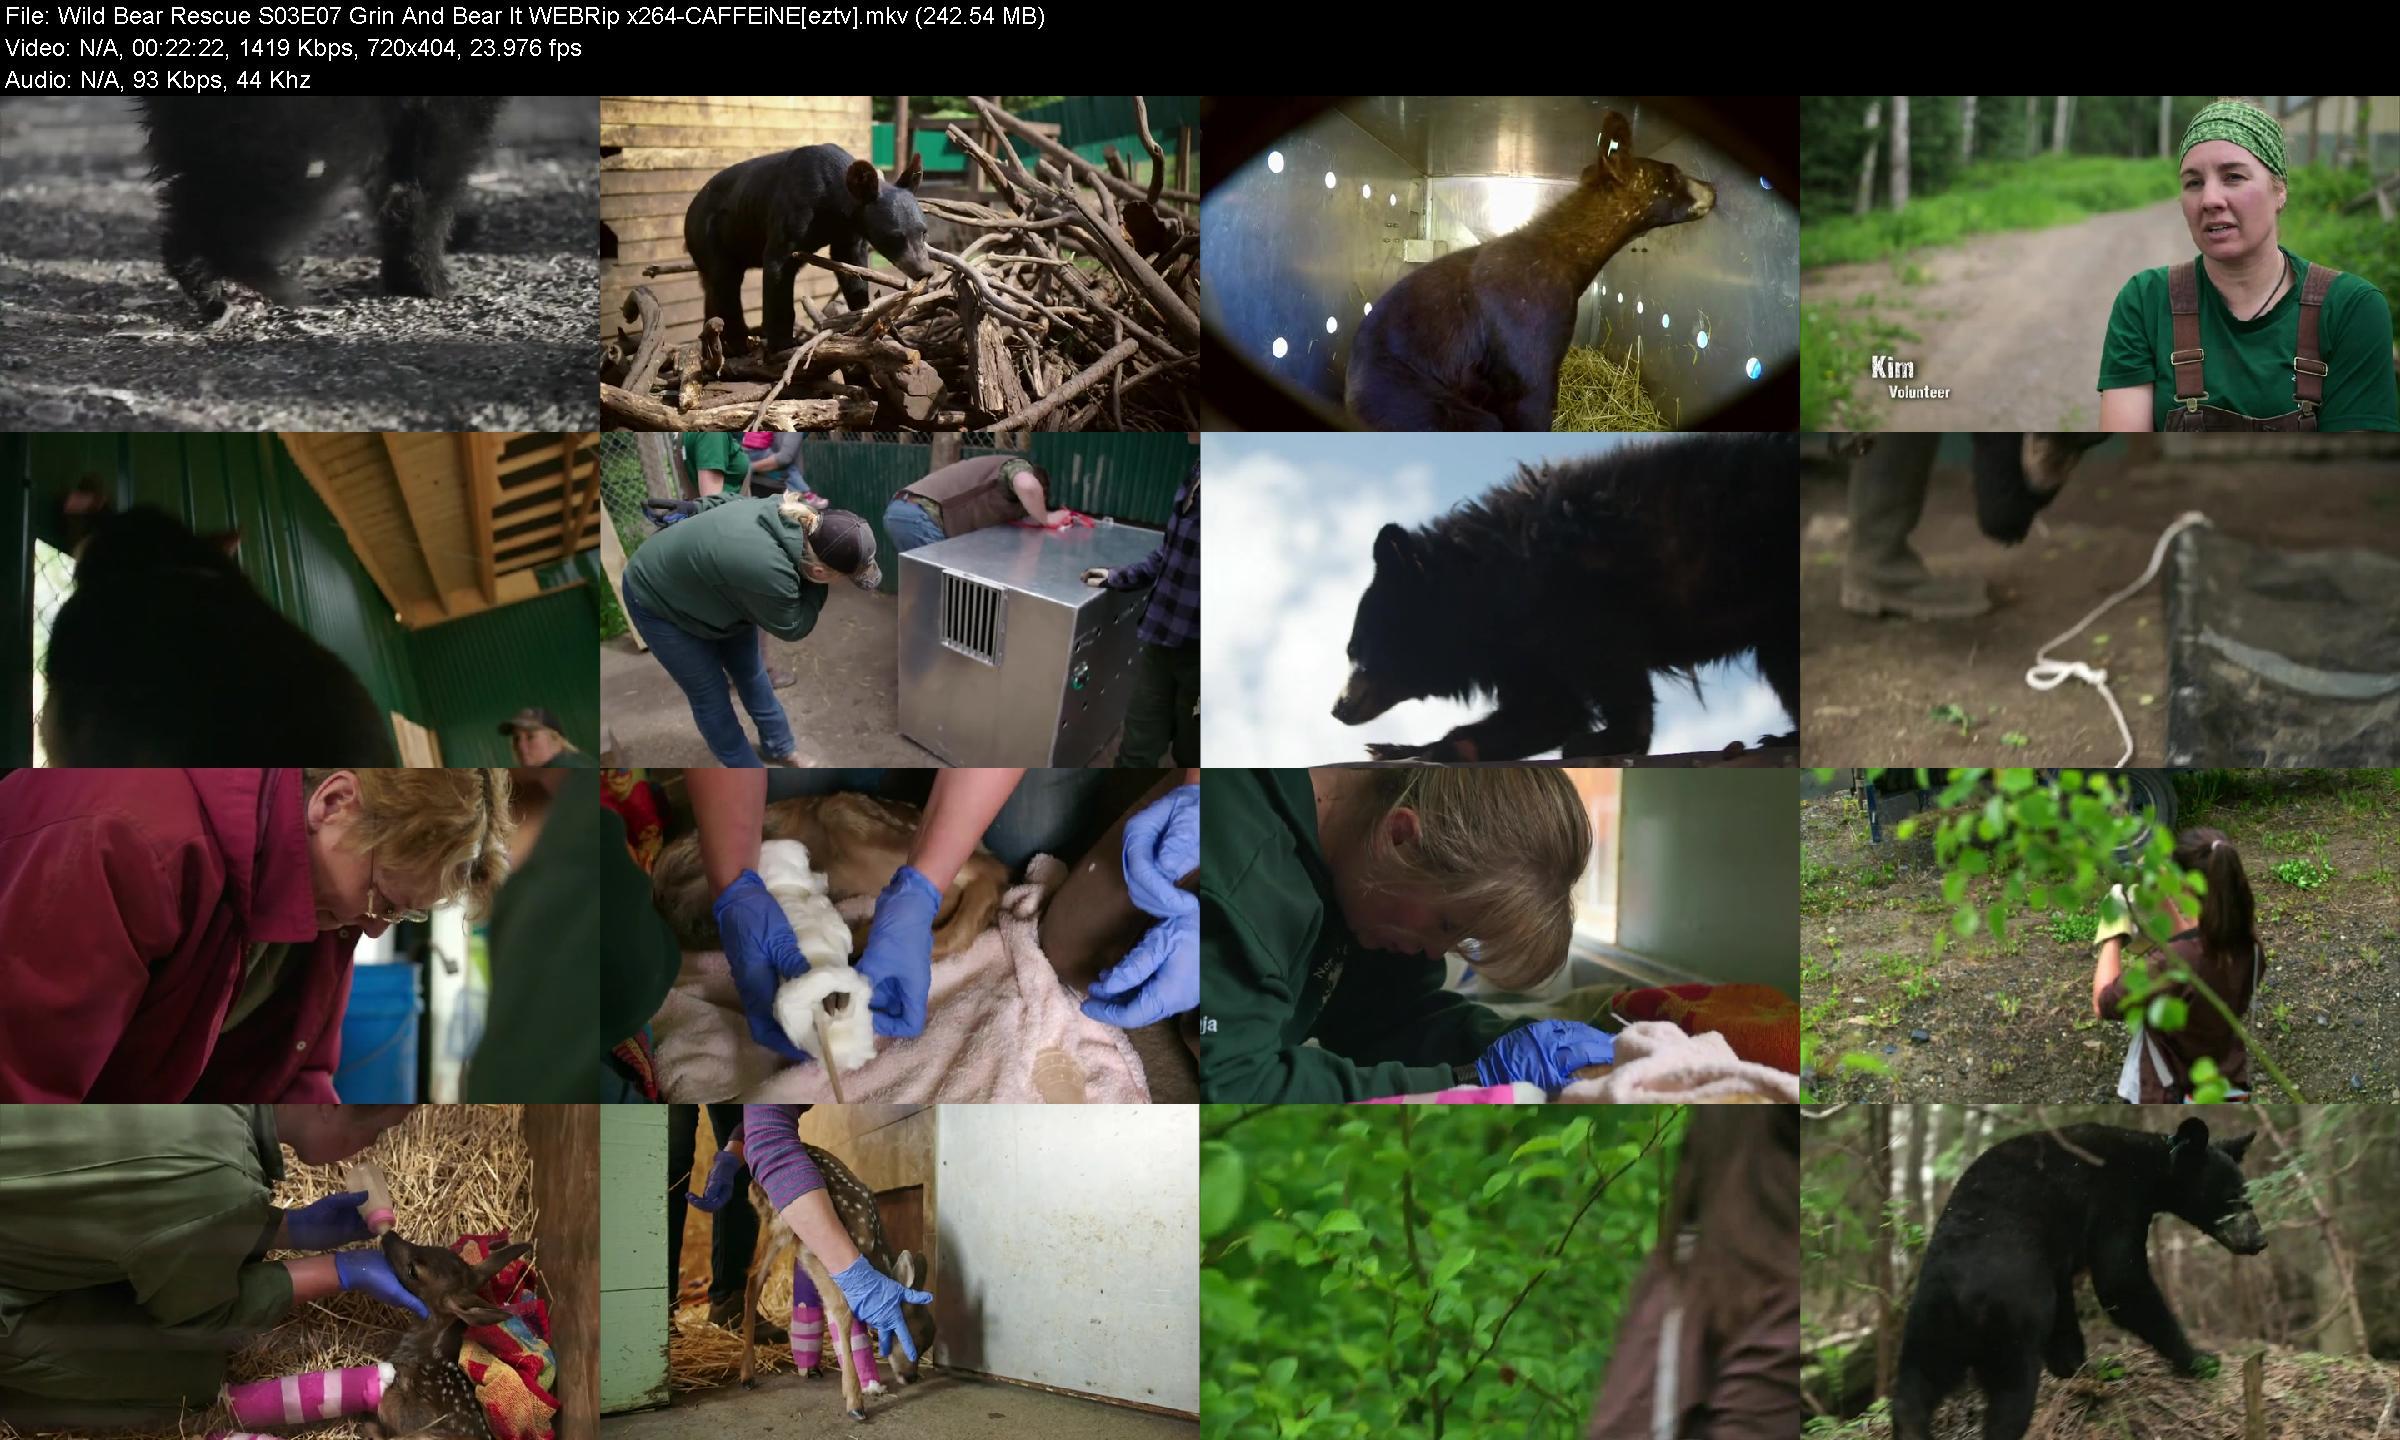 Wild Bear Rescue S03e07 Grin And Bear It Webrip X264-caffeine